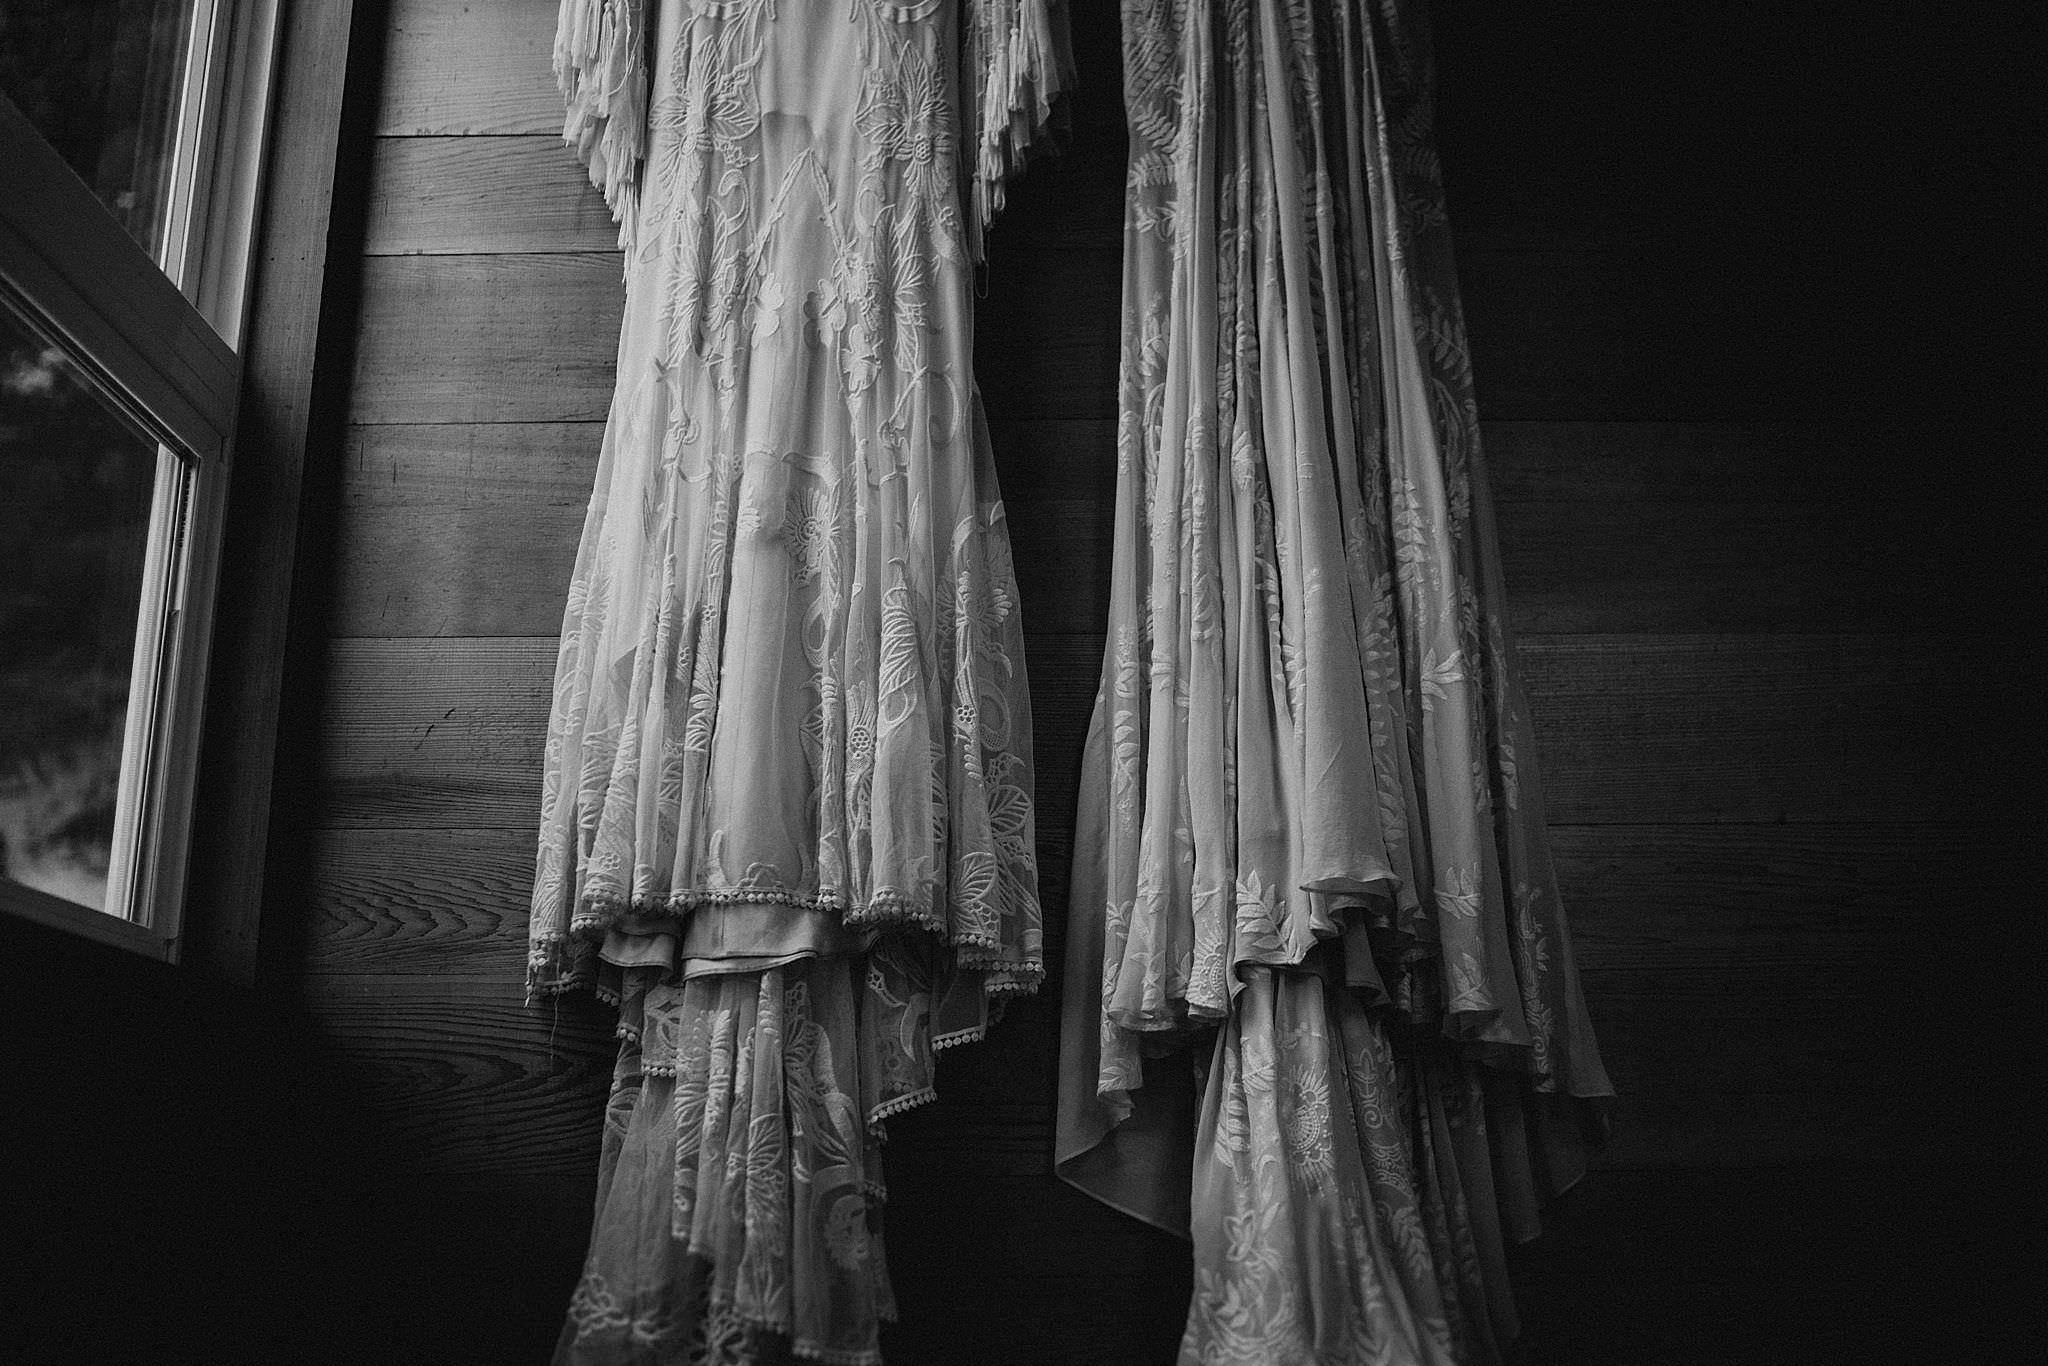 Rue de seine boho wedding dress for Olympic National Park Elopement at Ruby Beach Cabin